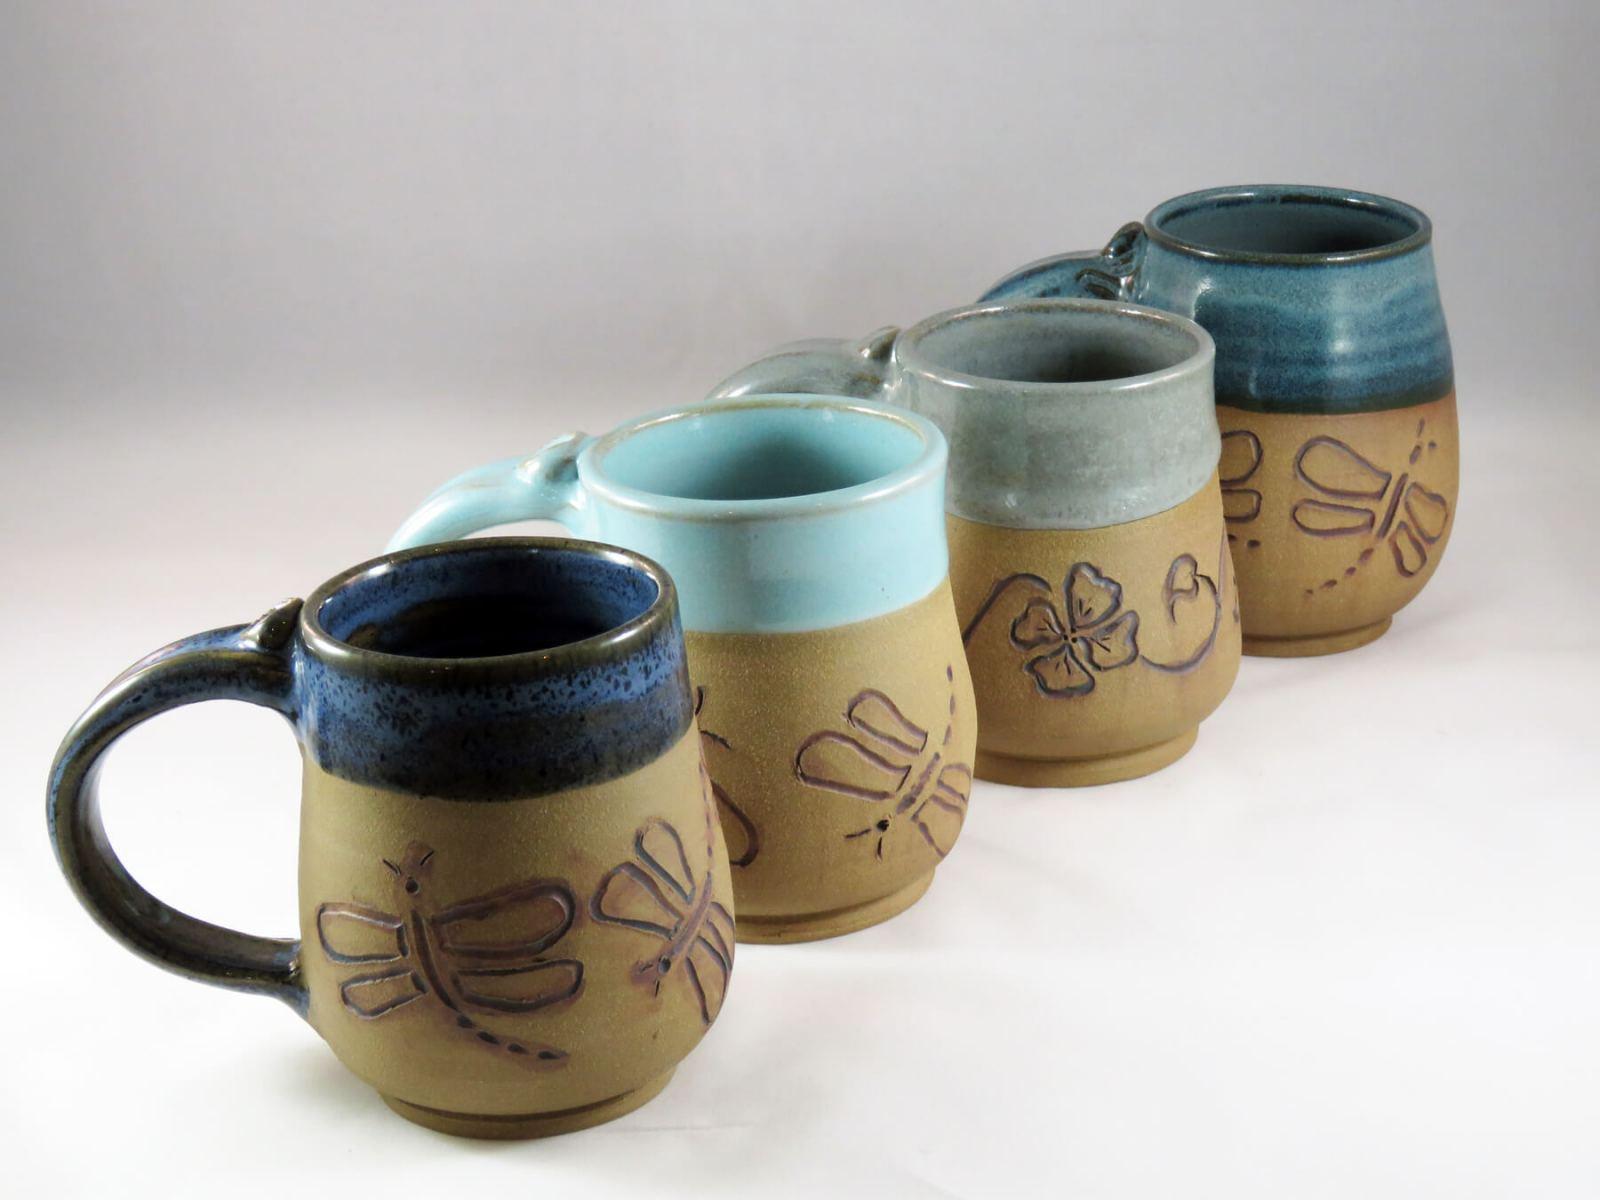 6-mugs-asst-colors